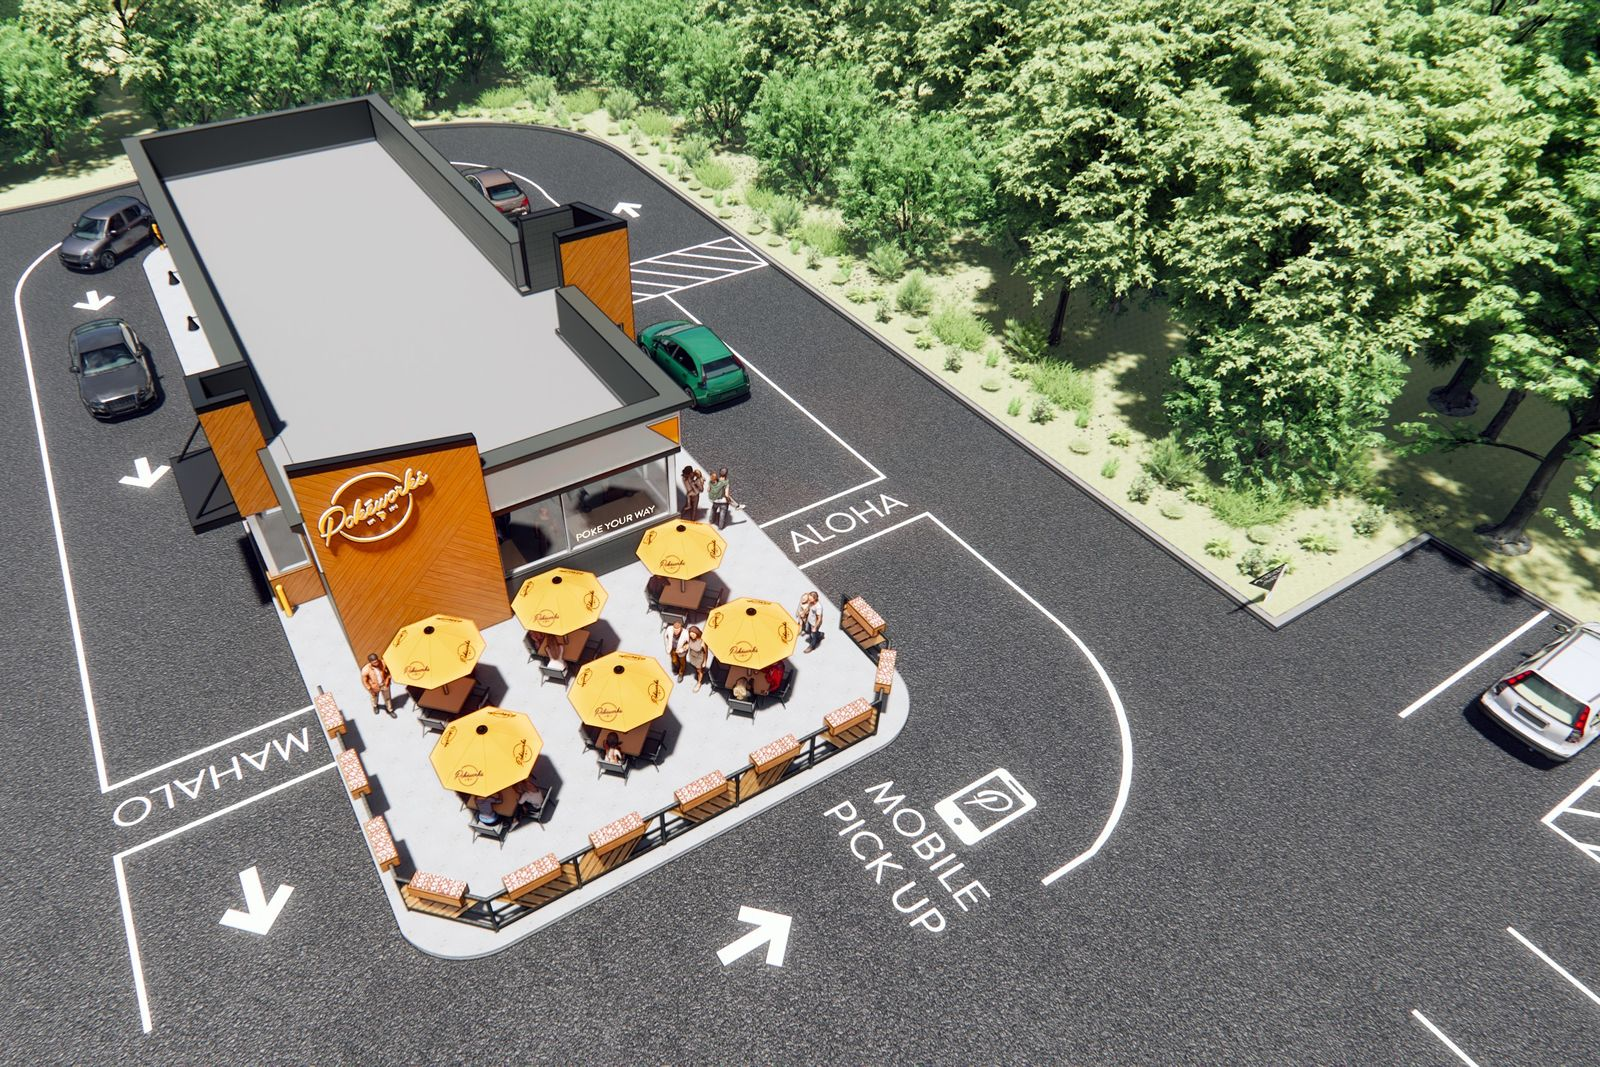 Pokeworks Unveils Prototype for Innovative Cruise-Thru Lane to Serve the Modern Consumer